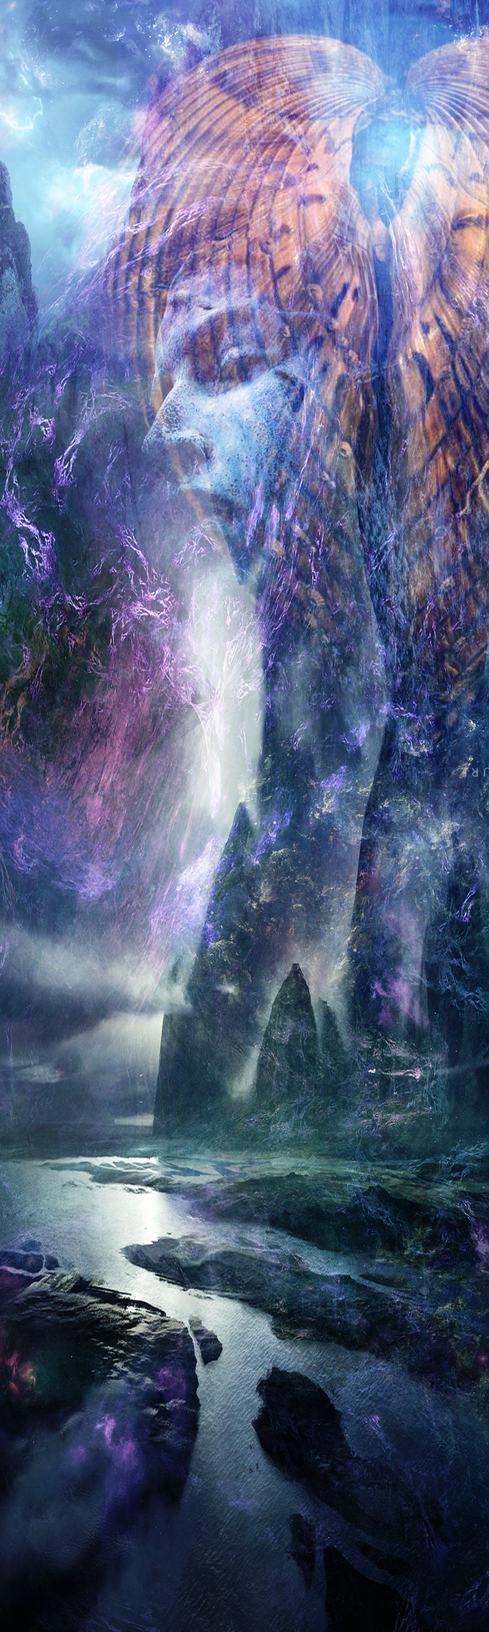 Sword of Eden by TALONABRAXAS